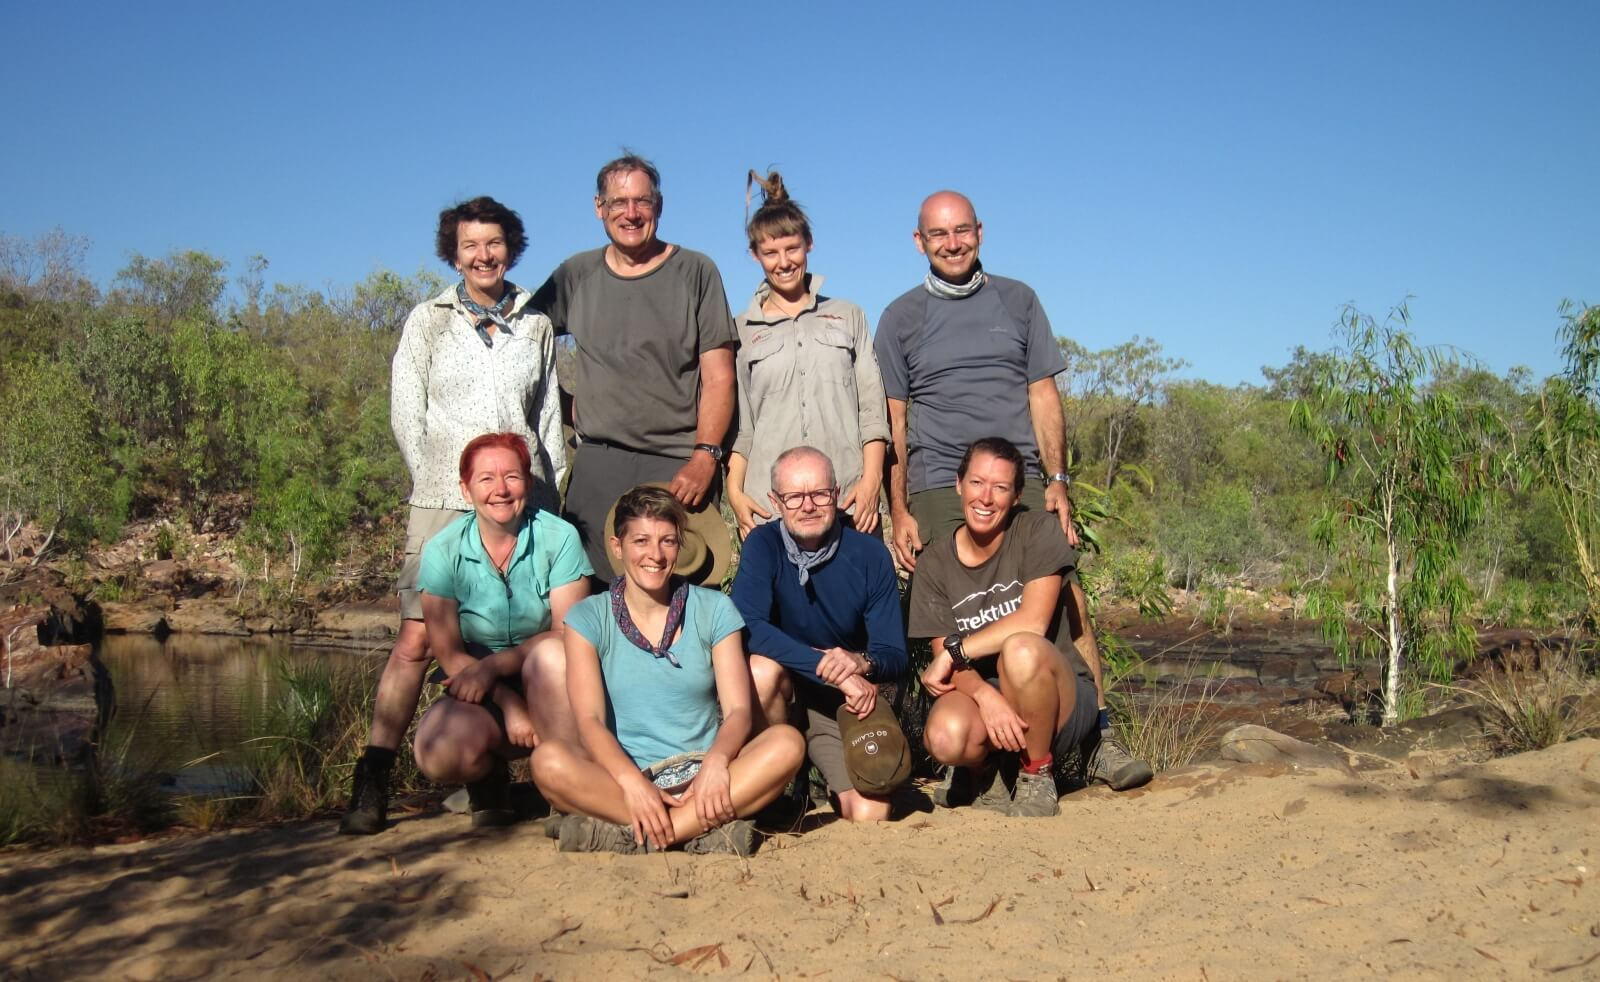 Companions on the trail: (top l to r) Lucy, Adam, Stella, Darrell (bottom l to r) Sue Ellen, Michelle, Alan, Kate